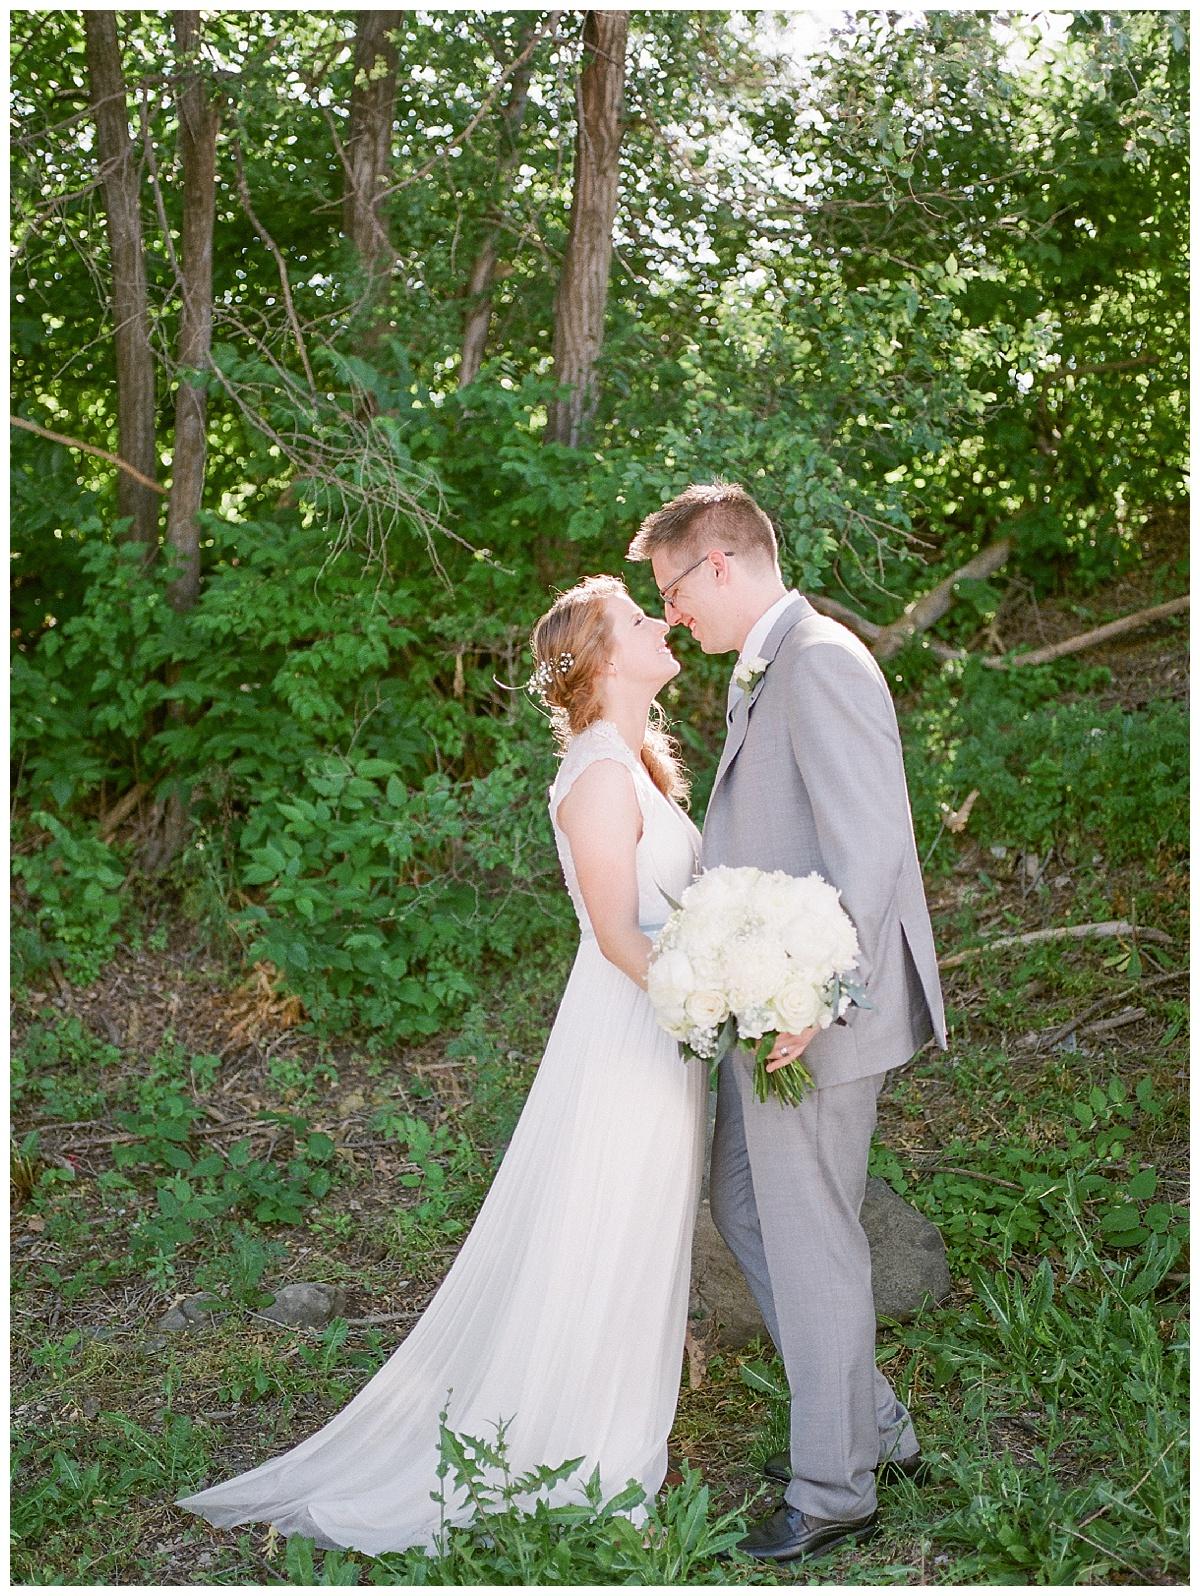 Central-Illinois-Wedding-Photographer-Champaign-The-City-Center-Fat_0566.jpg